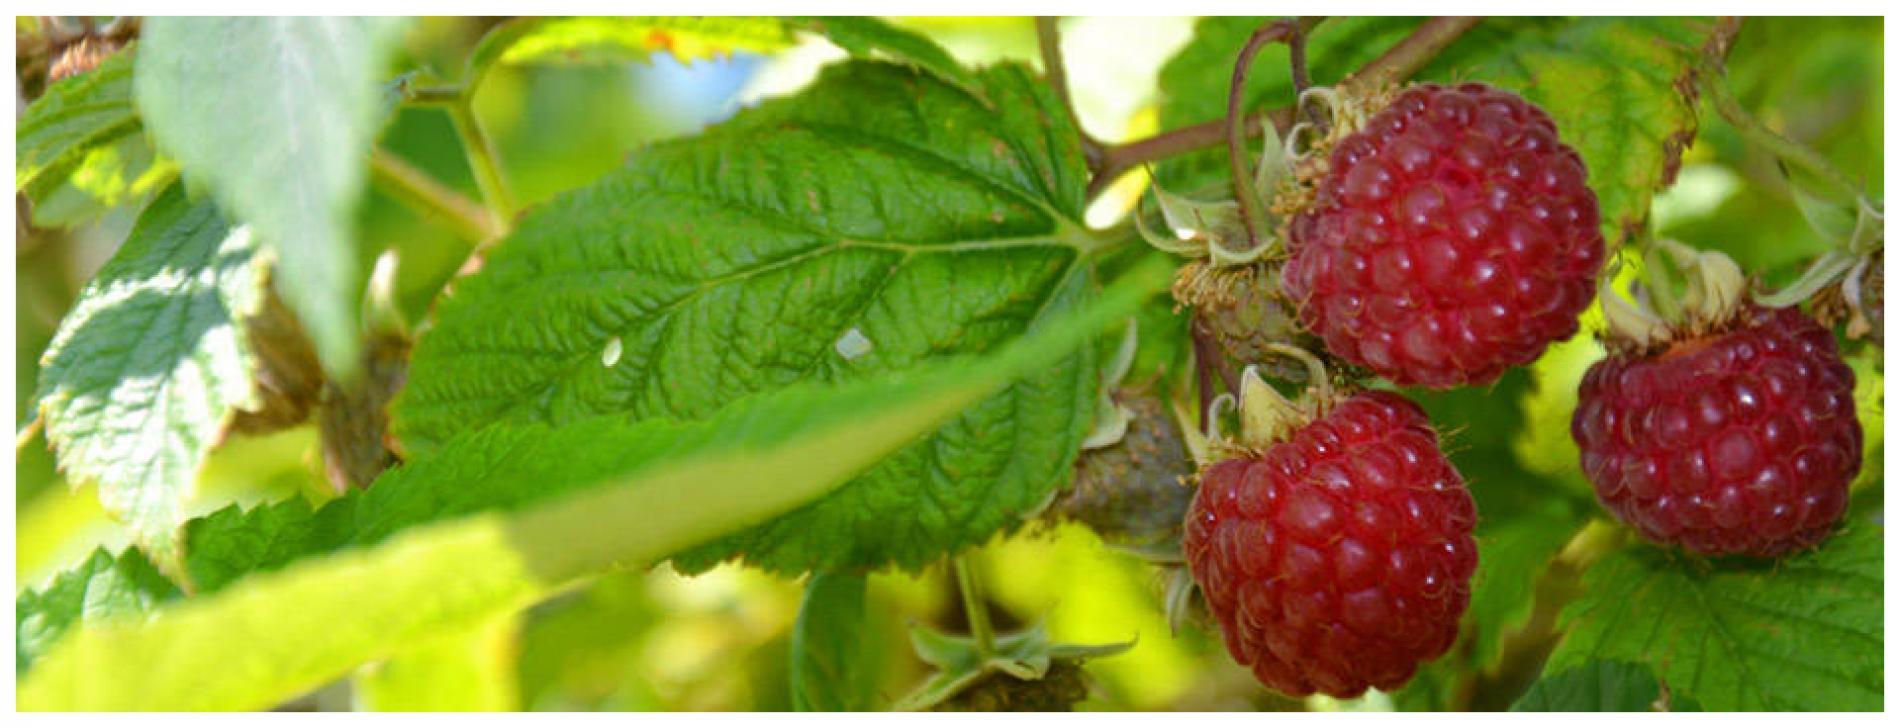 Raspberry domain